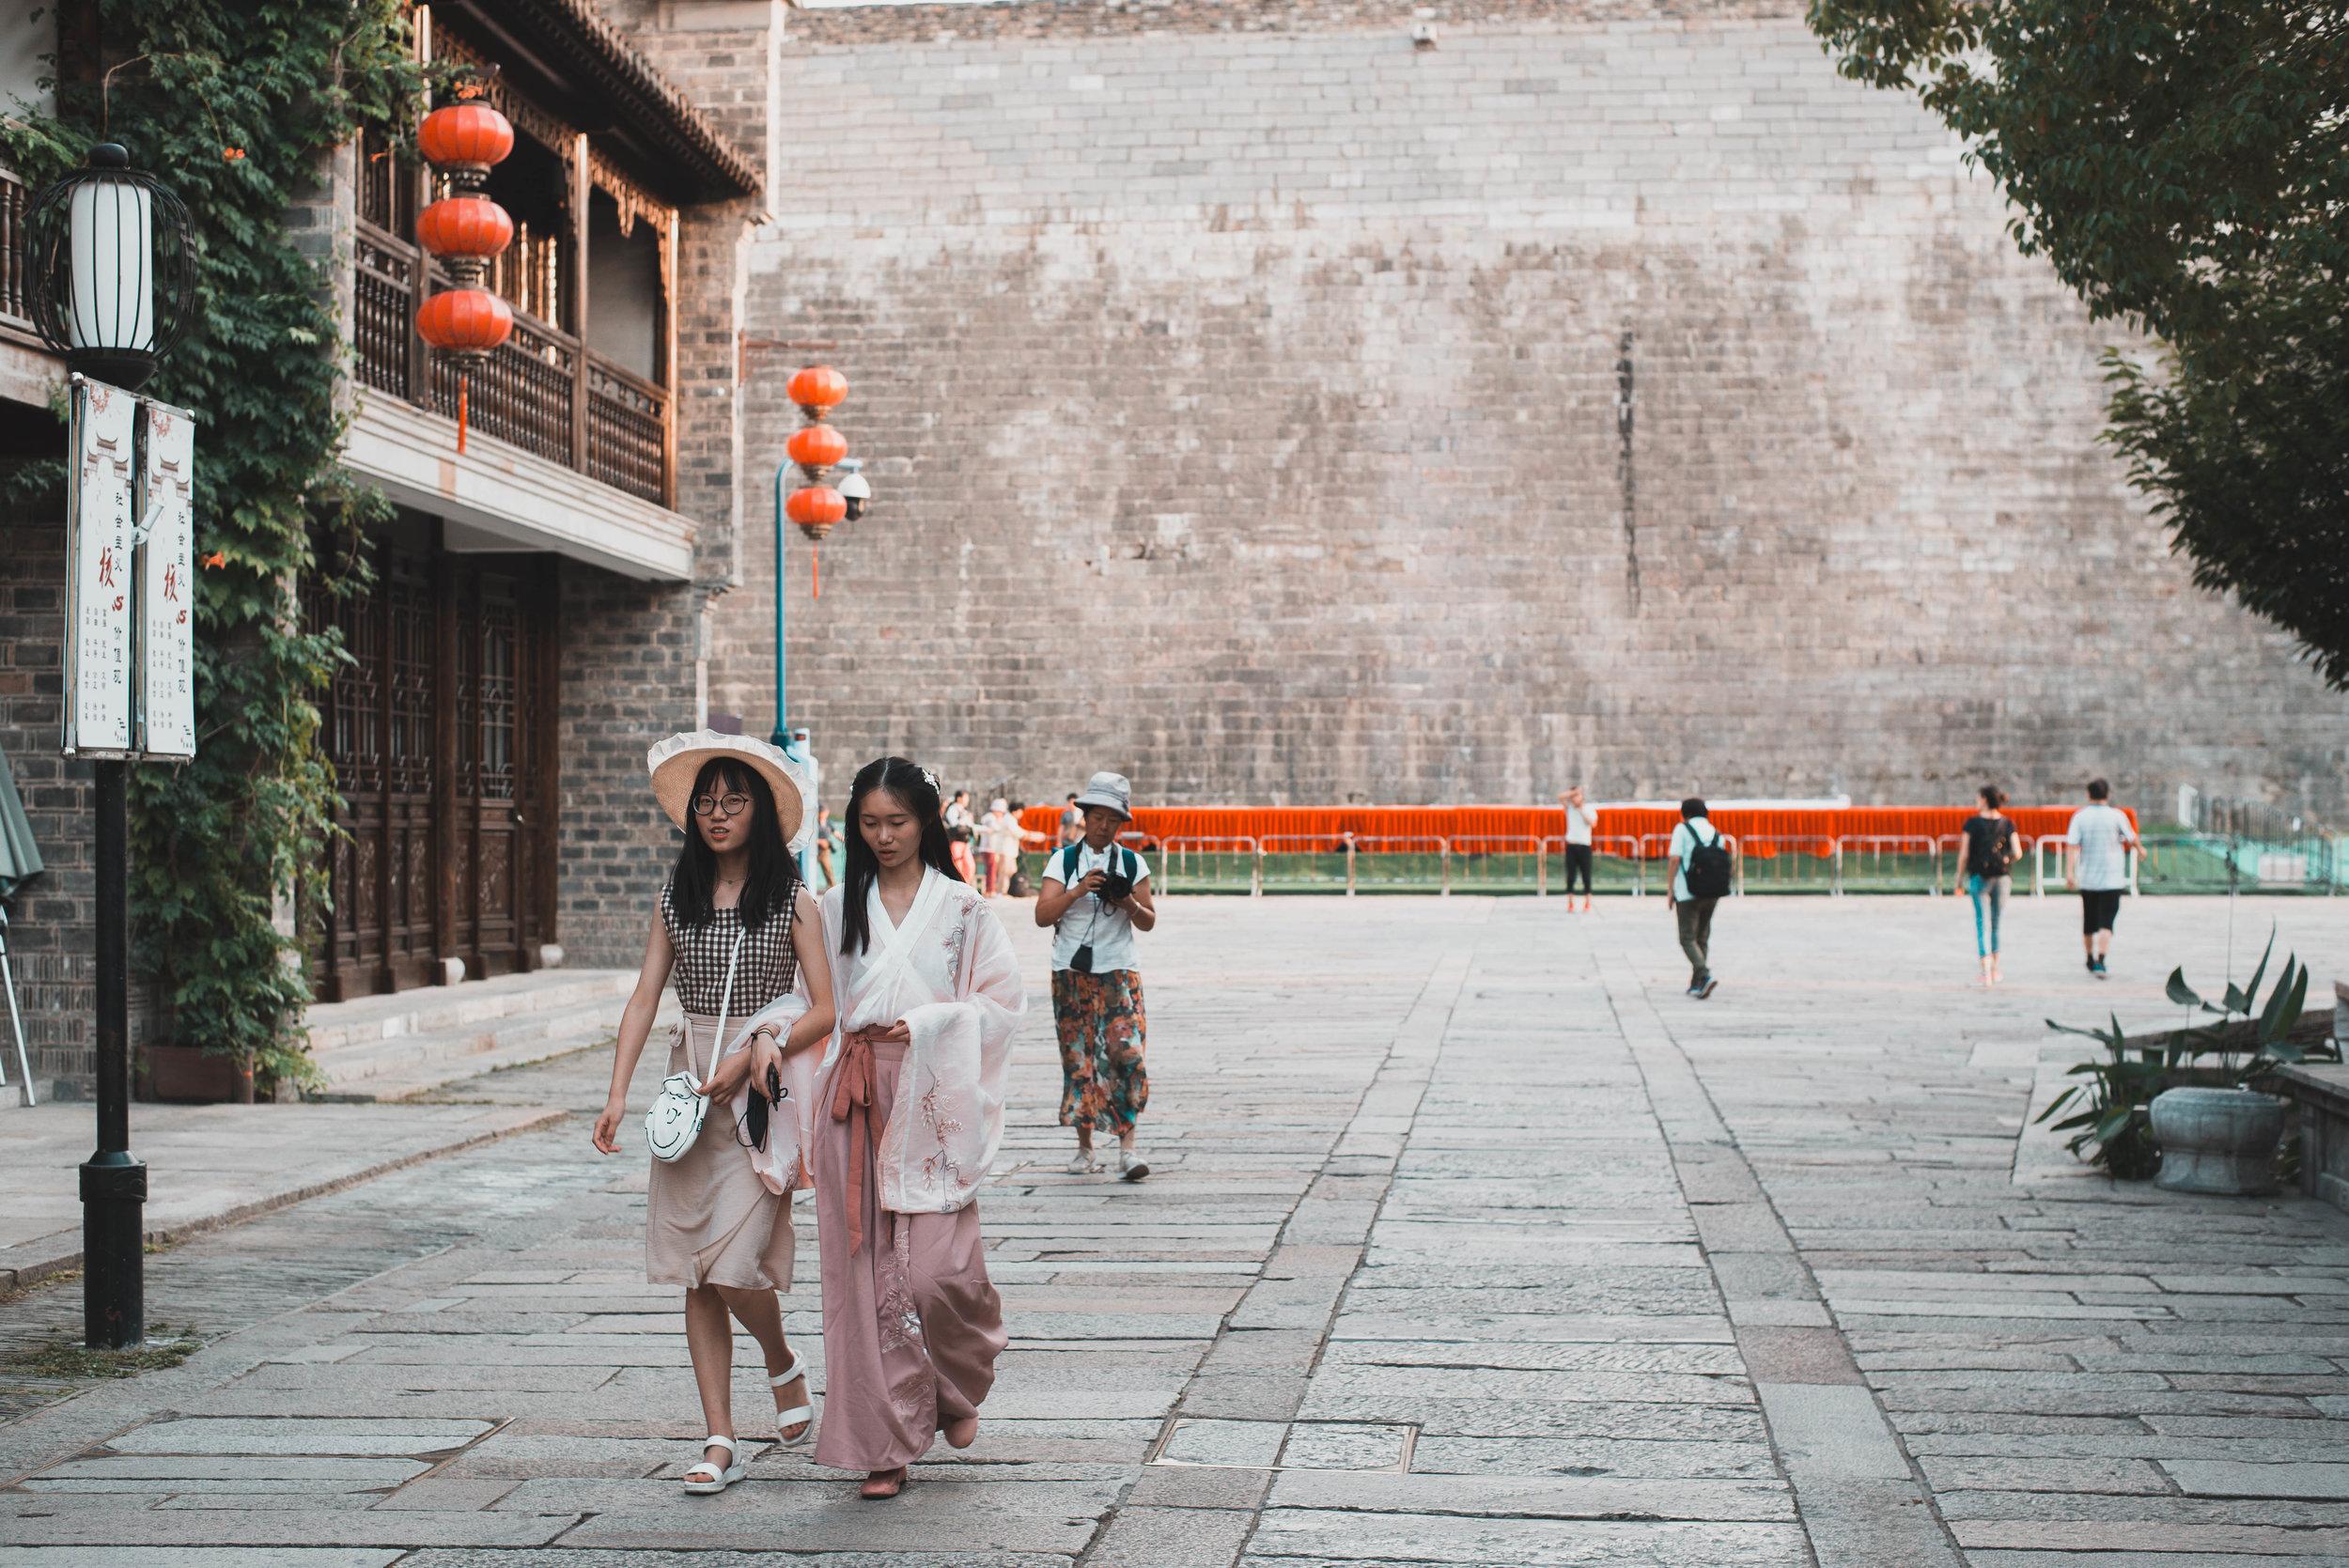 The grand city wall of Nanjing